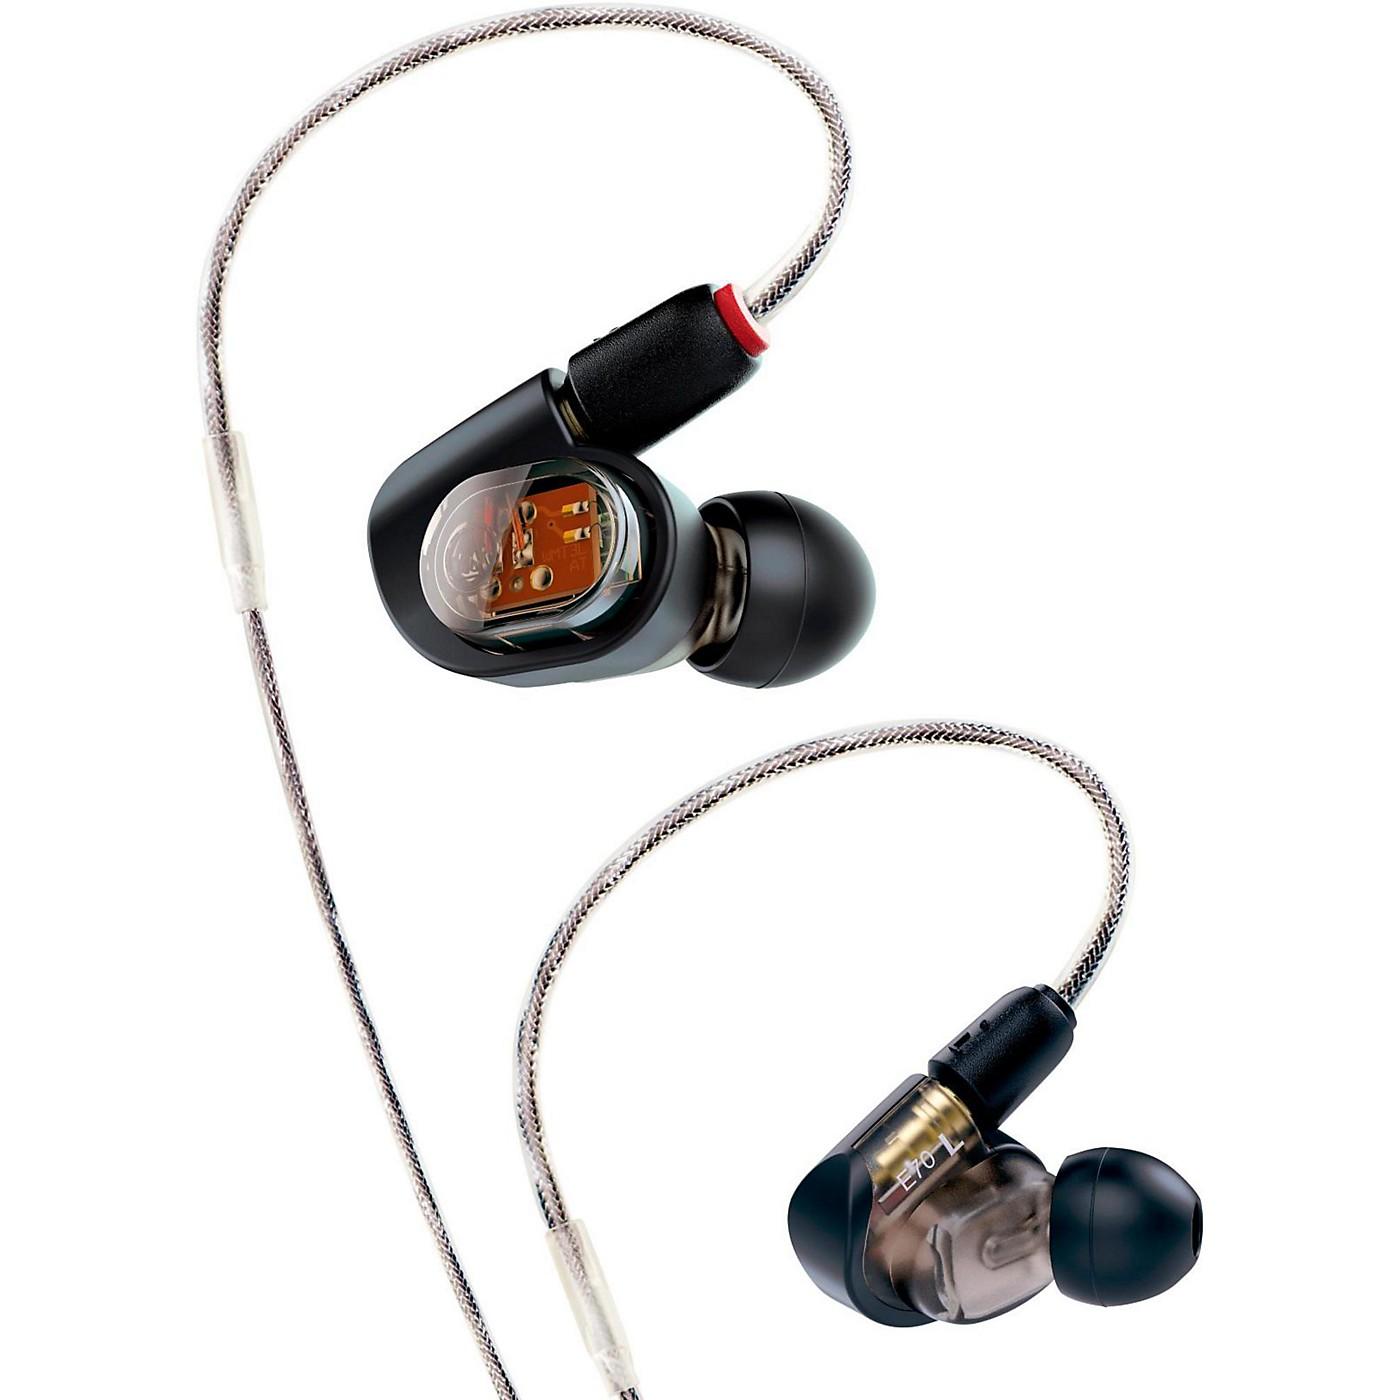 Audio-Technica ATH-E70 Professional In-Ear Monitor Headphones thumbnail